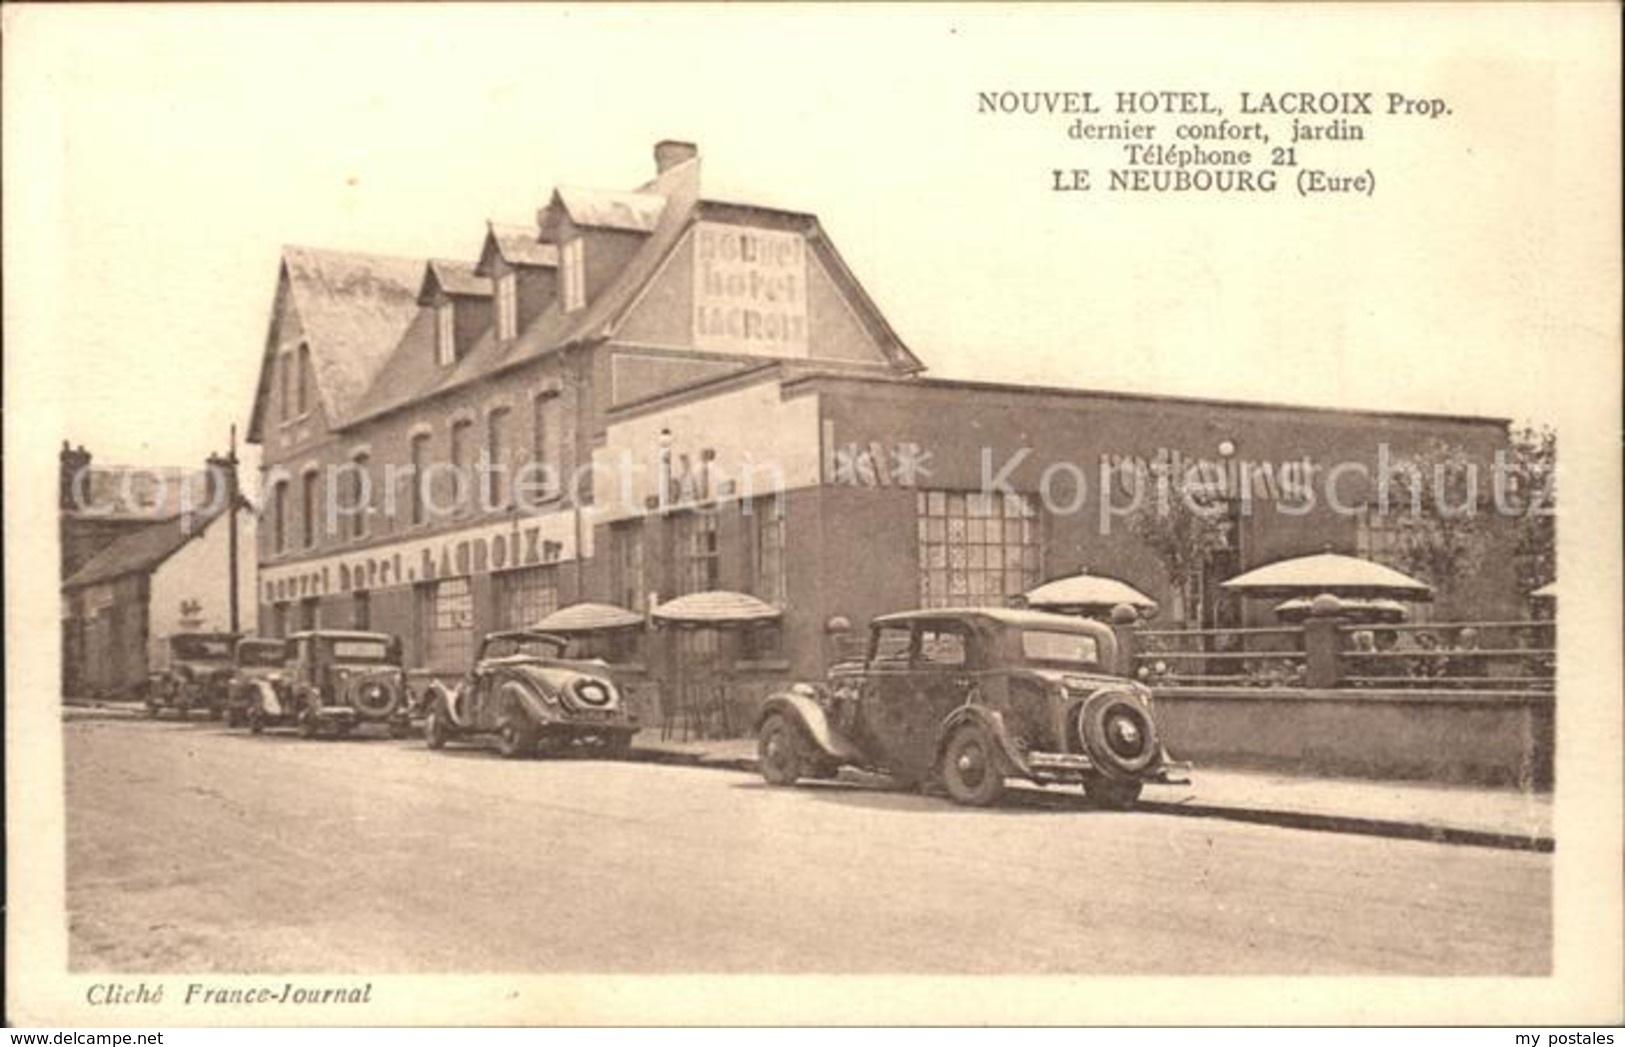 11919491 Le Neubourg Nouvel Hotel Le Neubourg - Le Neubourg